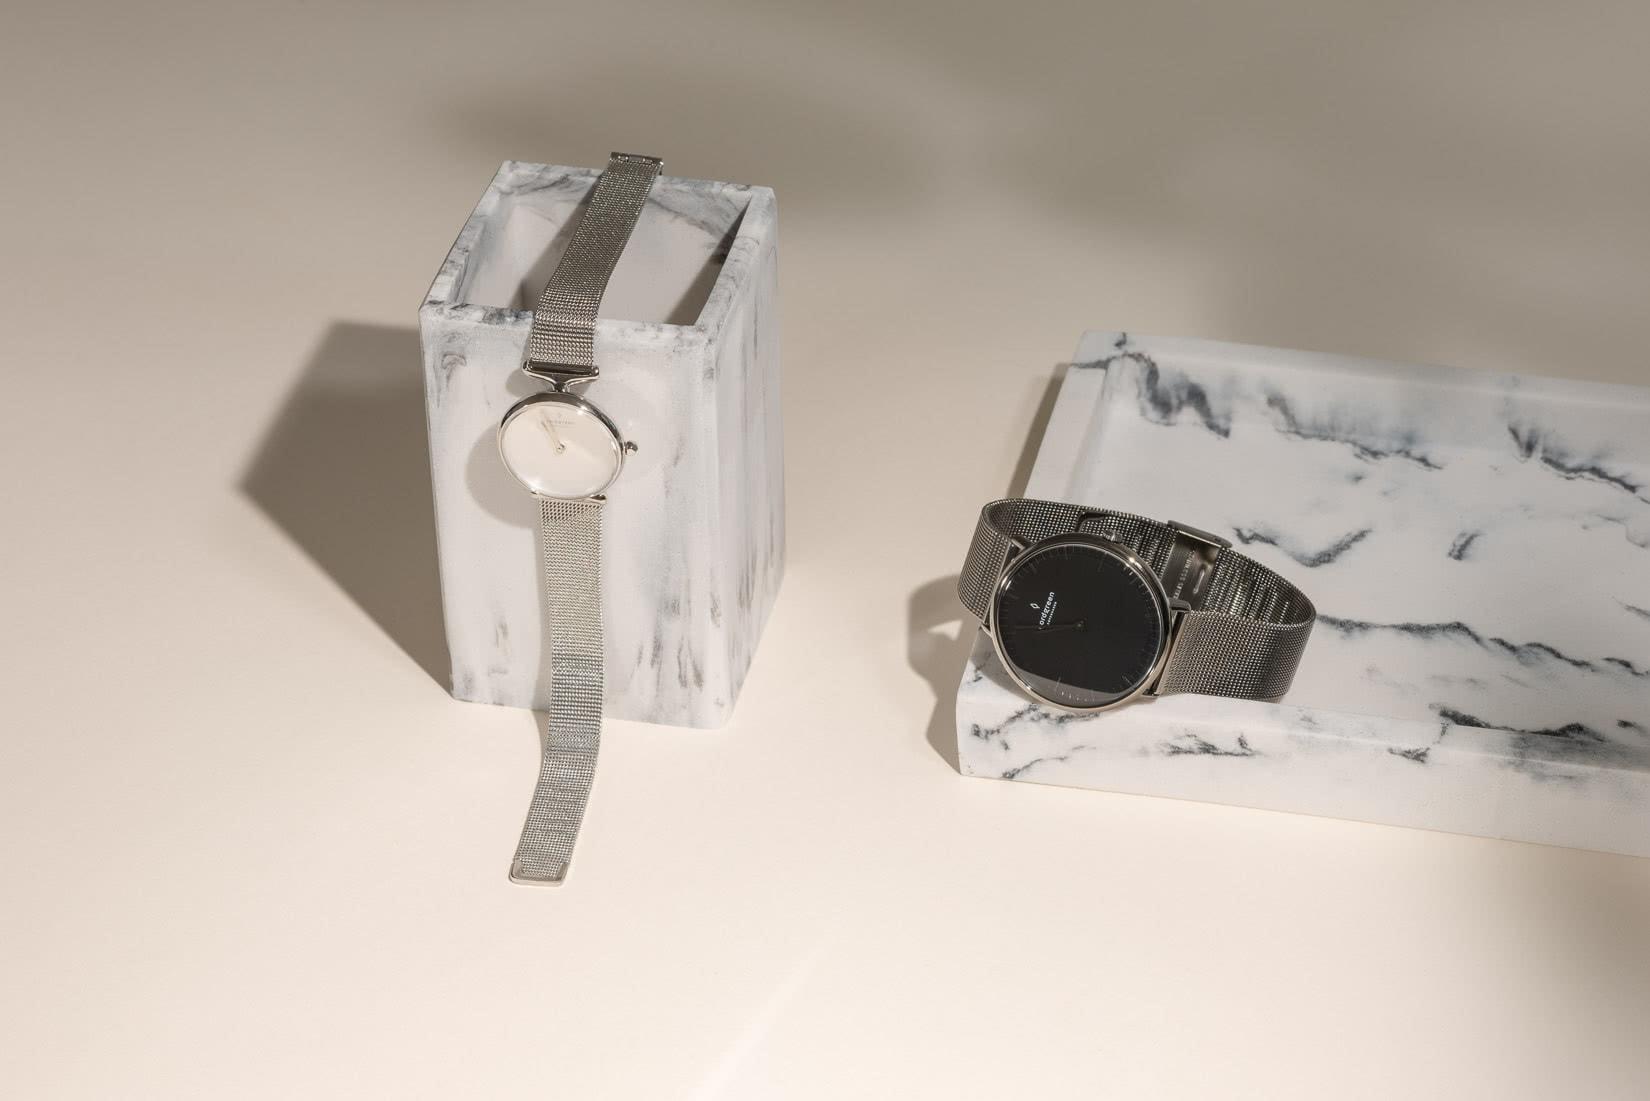 nordgreen watches men women review - Luxe Digital